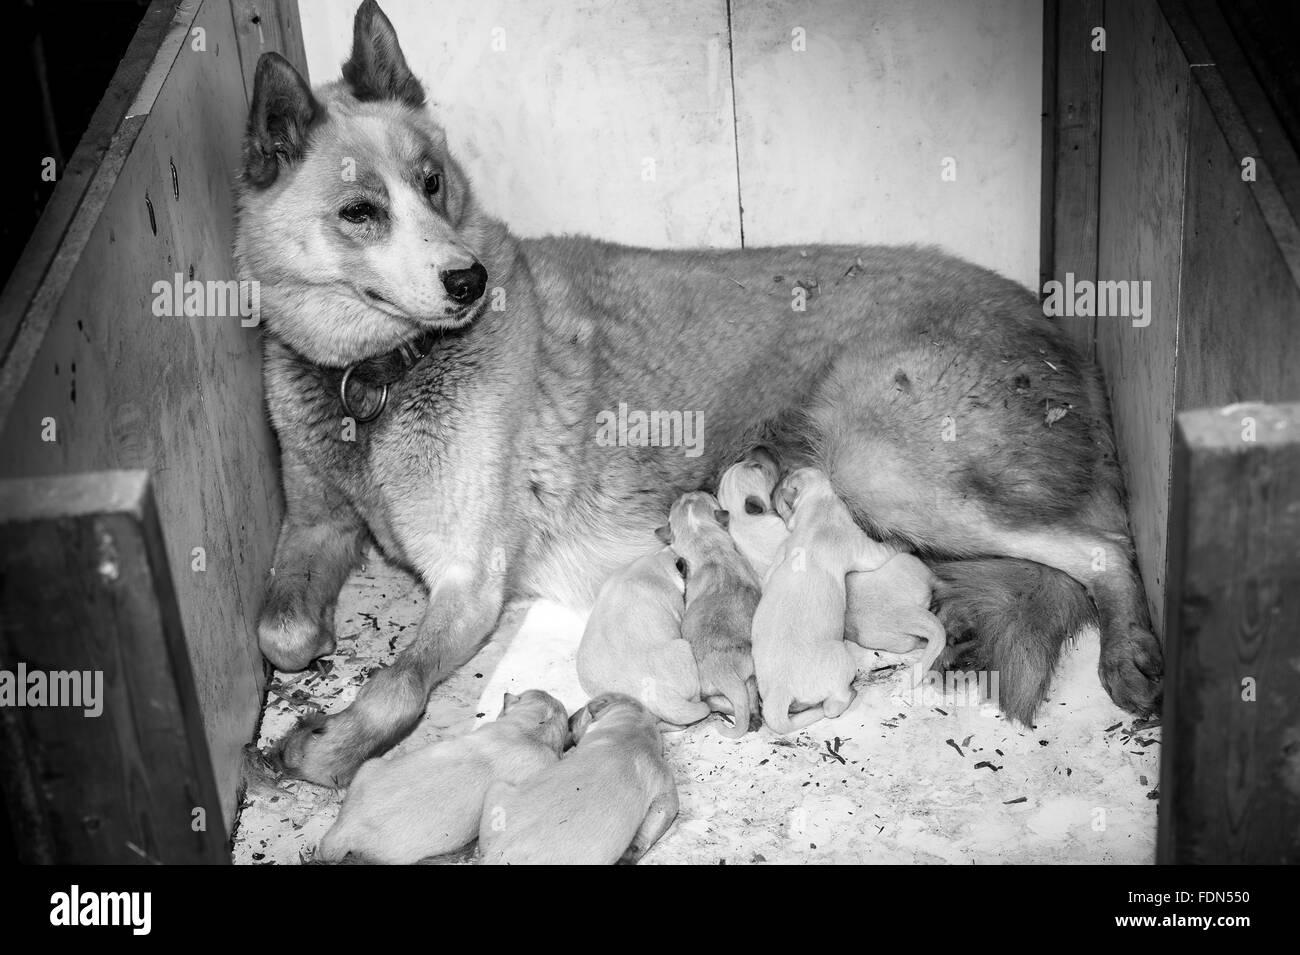 female husky dog giving birth and nourishing its family - Stock Image